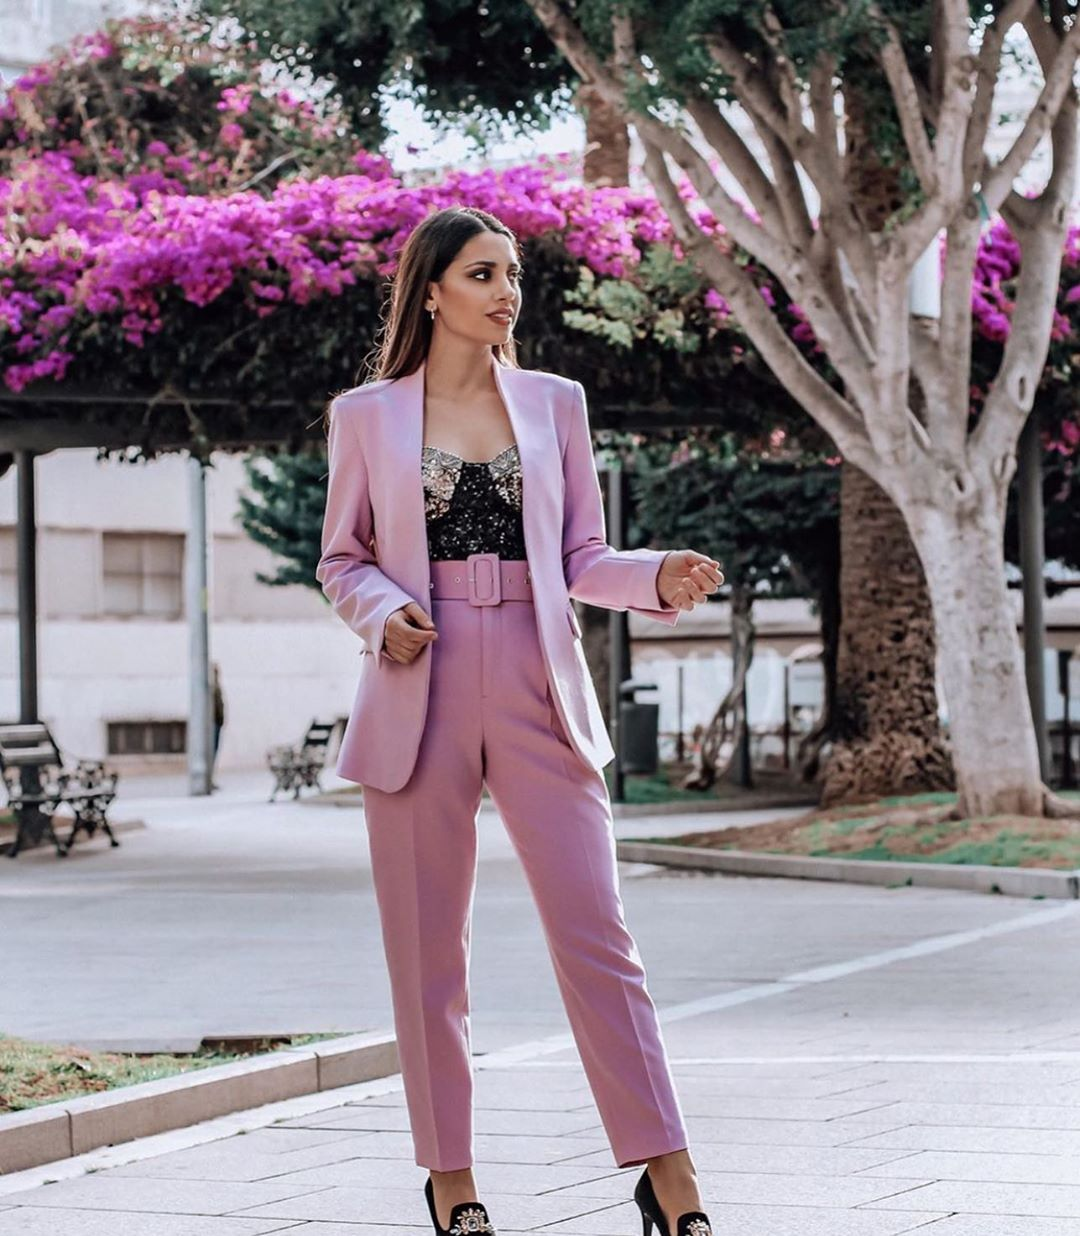 veste avec décolleté en v de Zara sur zara.outfits